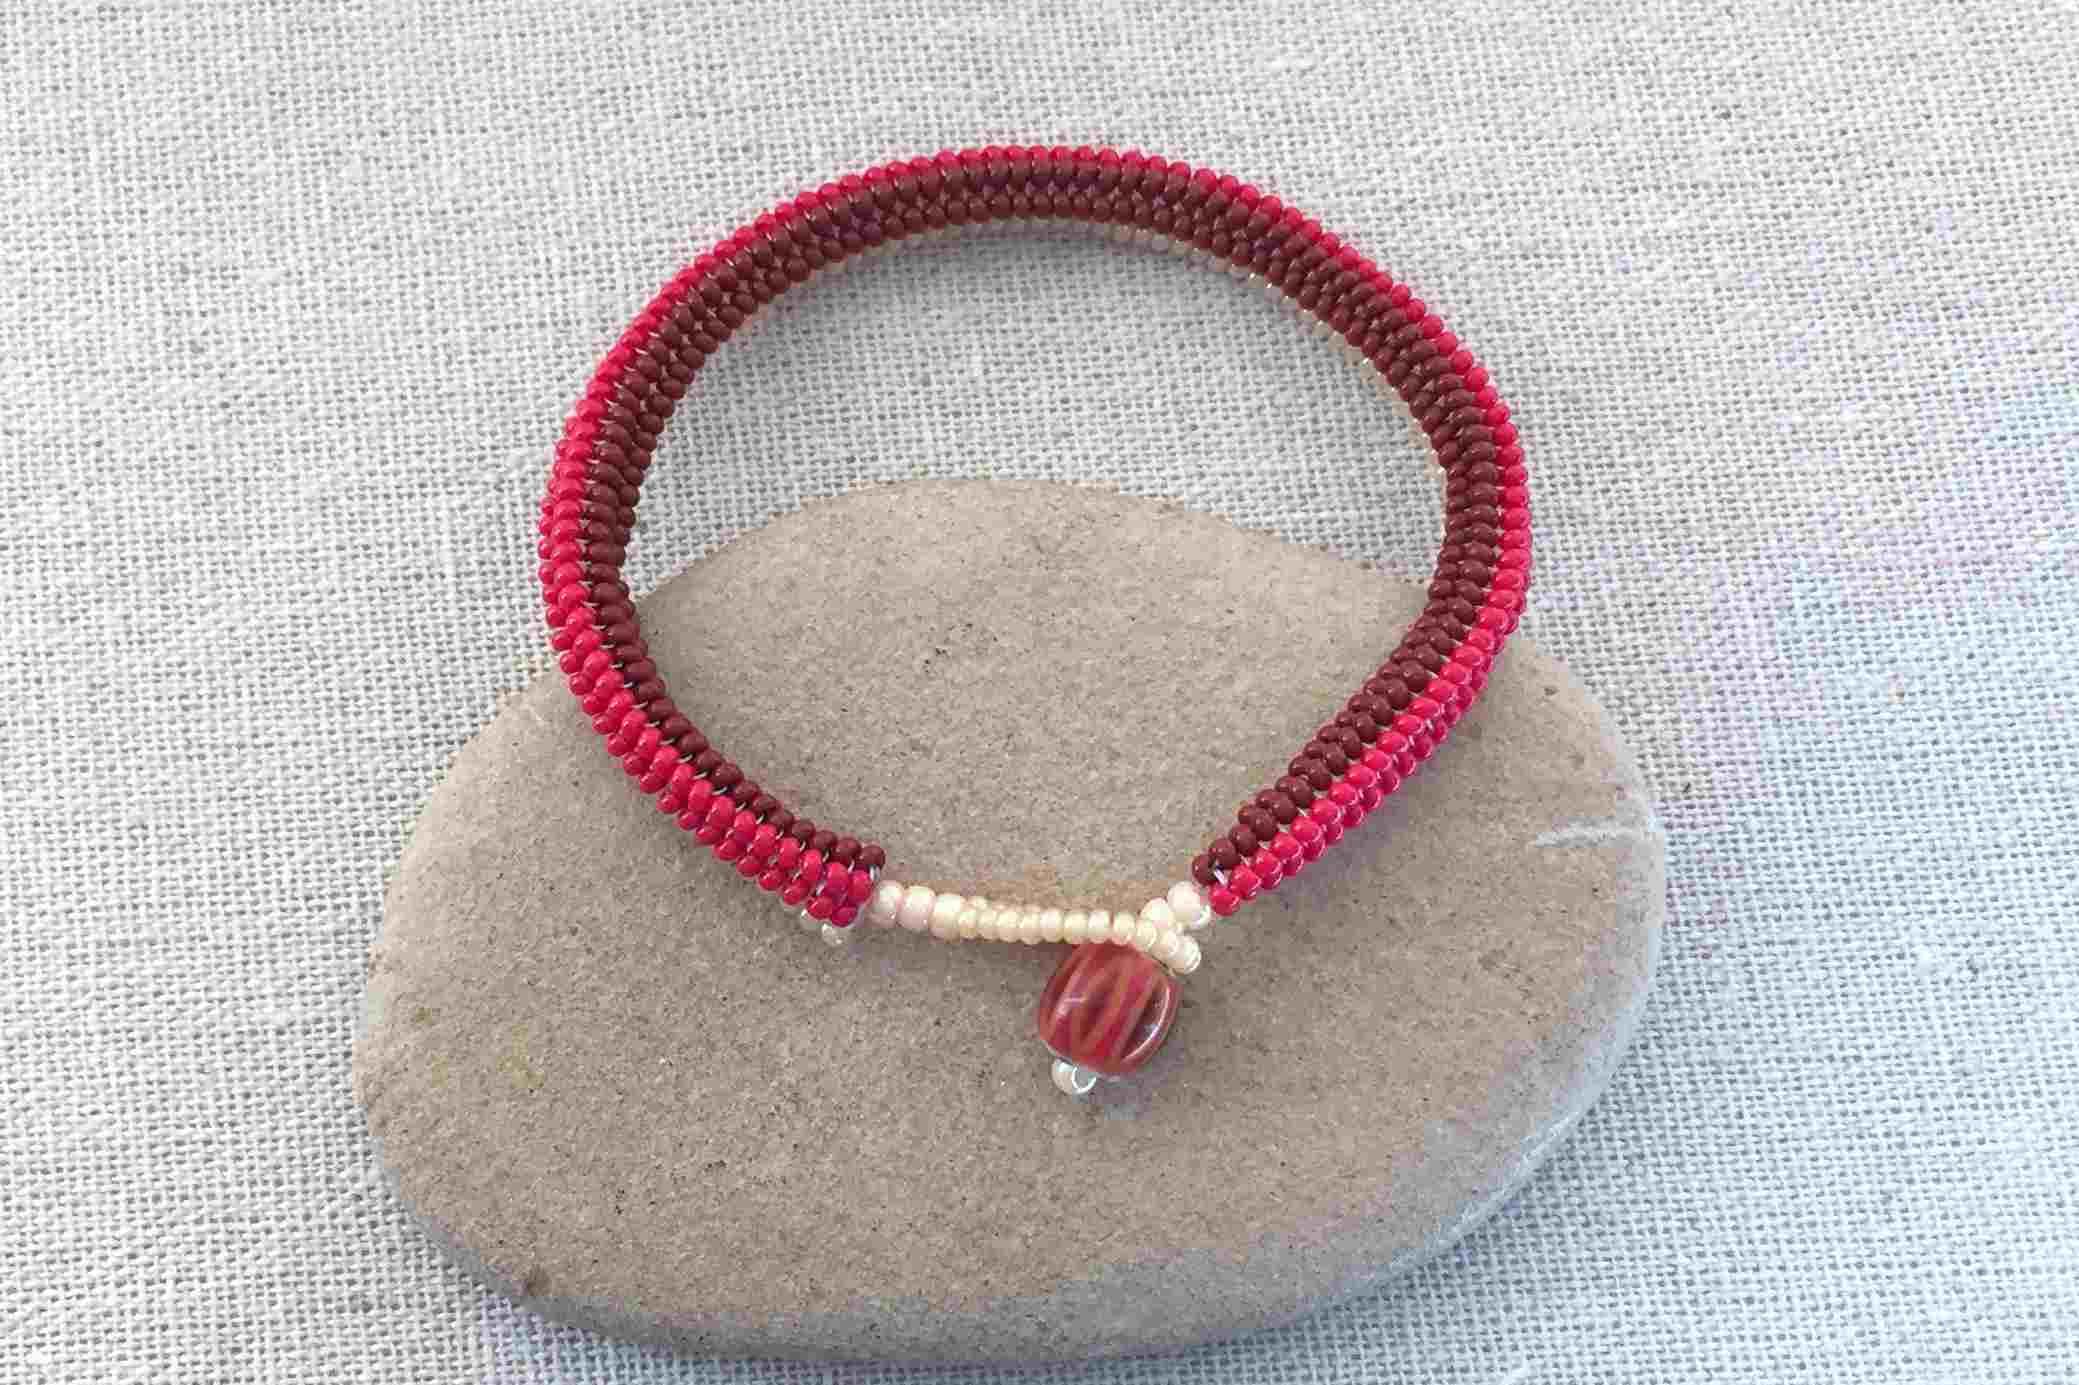 Tubular Herringbone Bracelet Tutorial